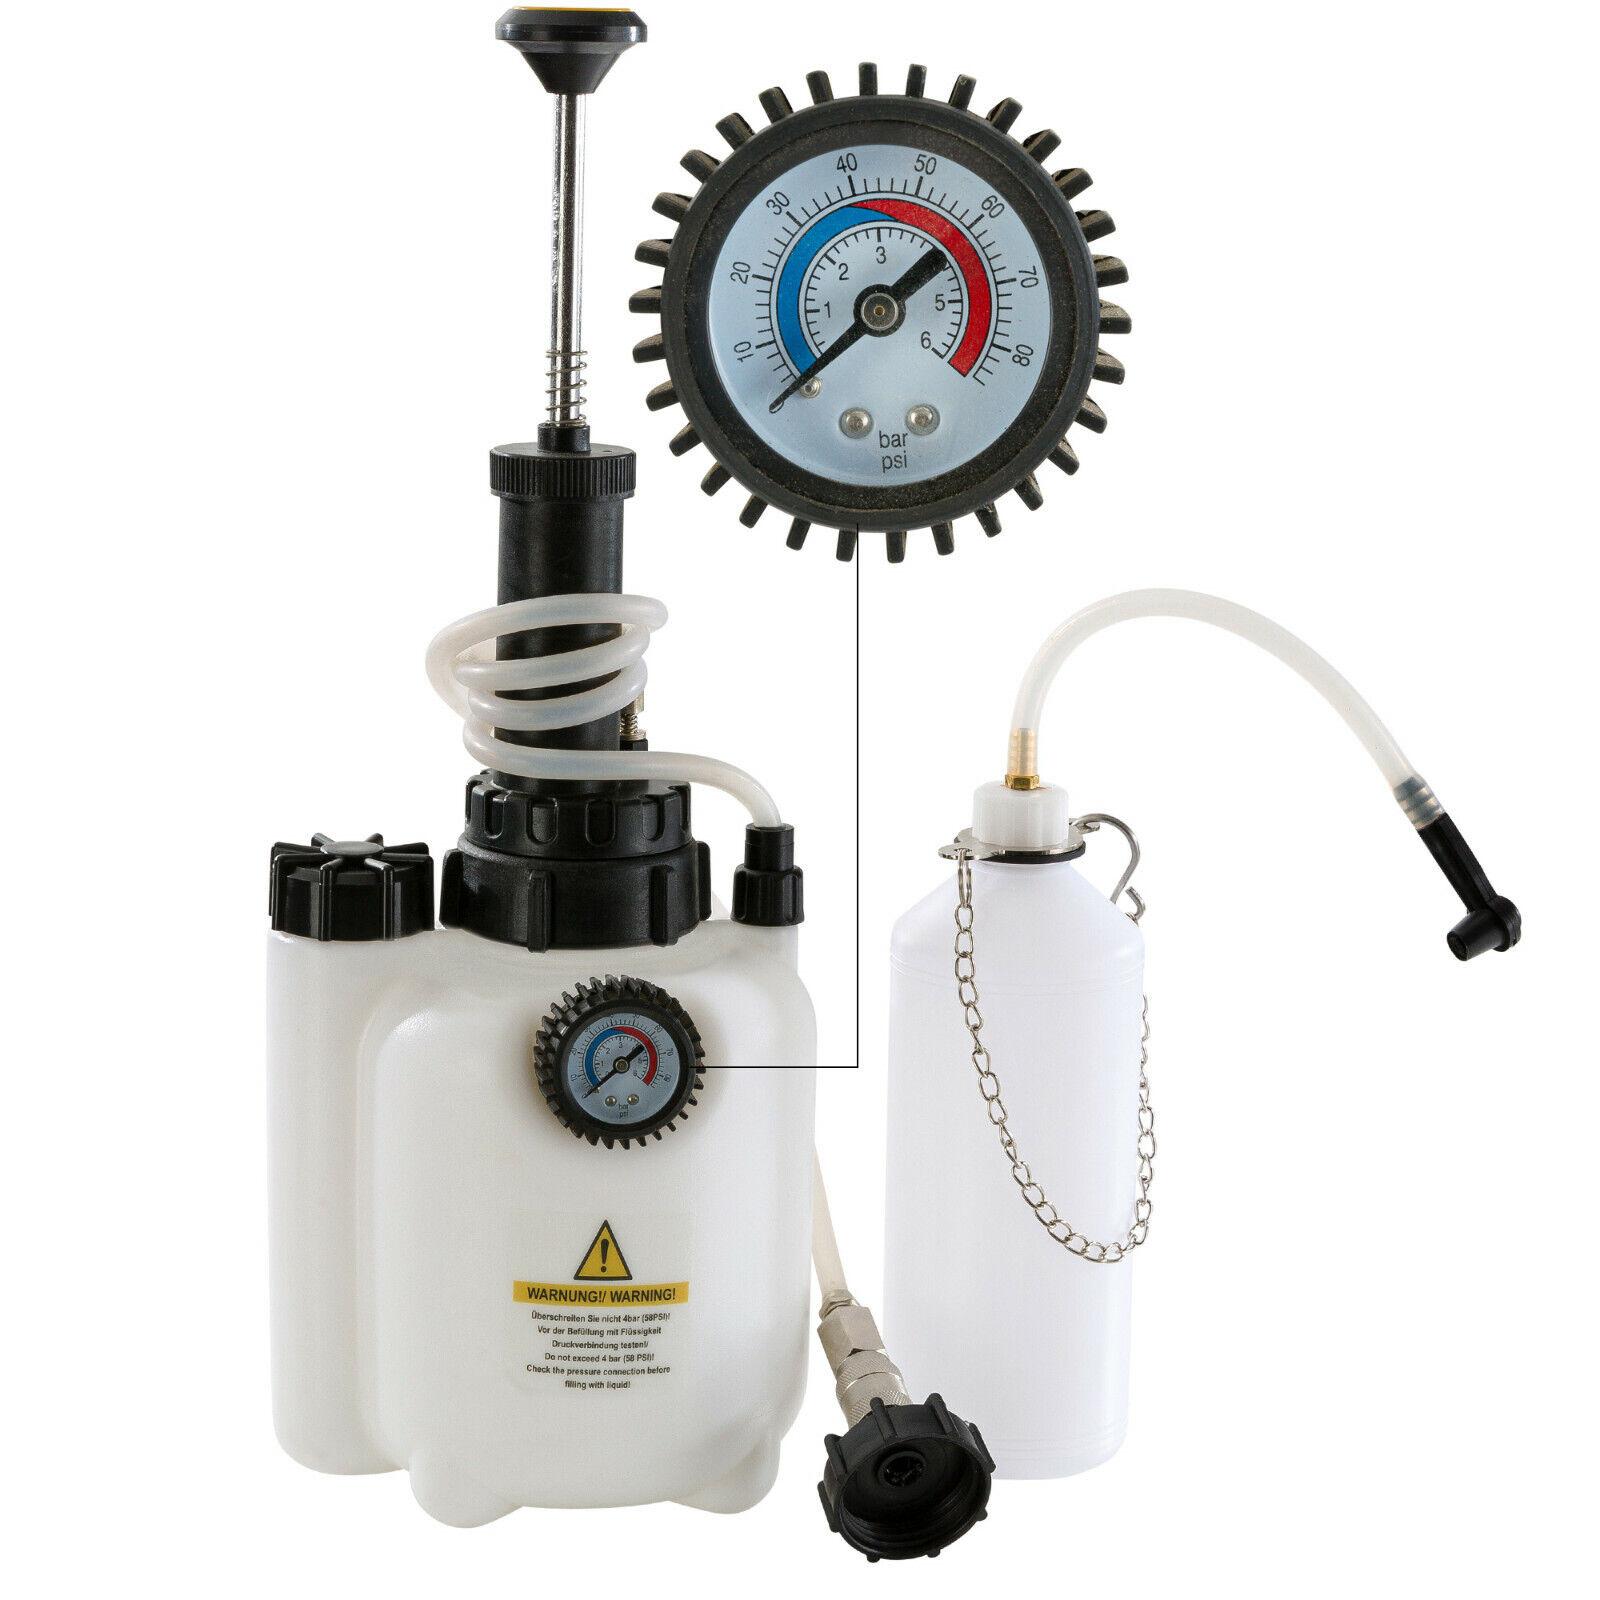 Bremsenentlüftungsgerät 400 ml Handpumpe Bremsenentlüfter Einfüllgerät entlüfter